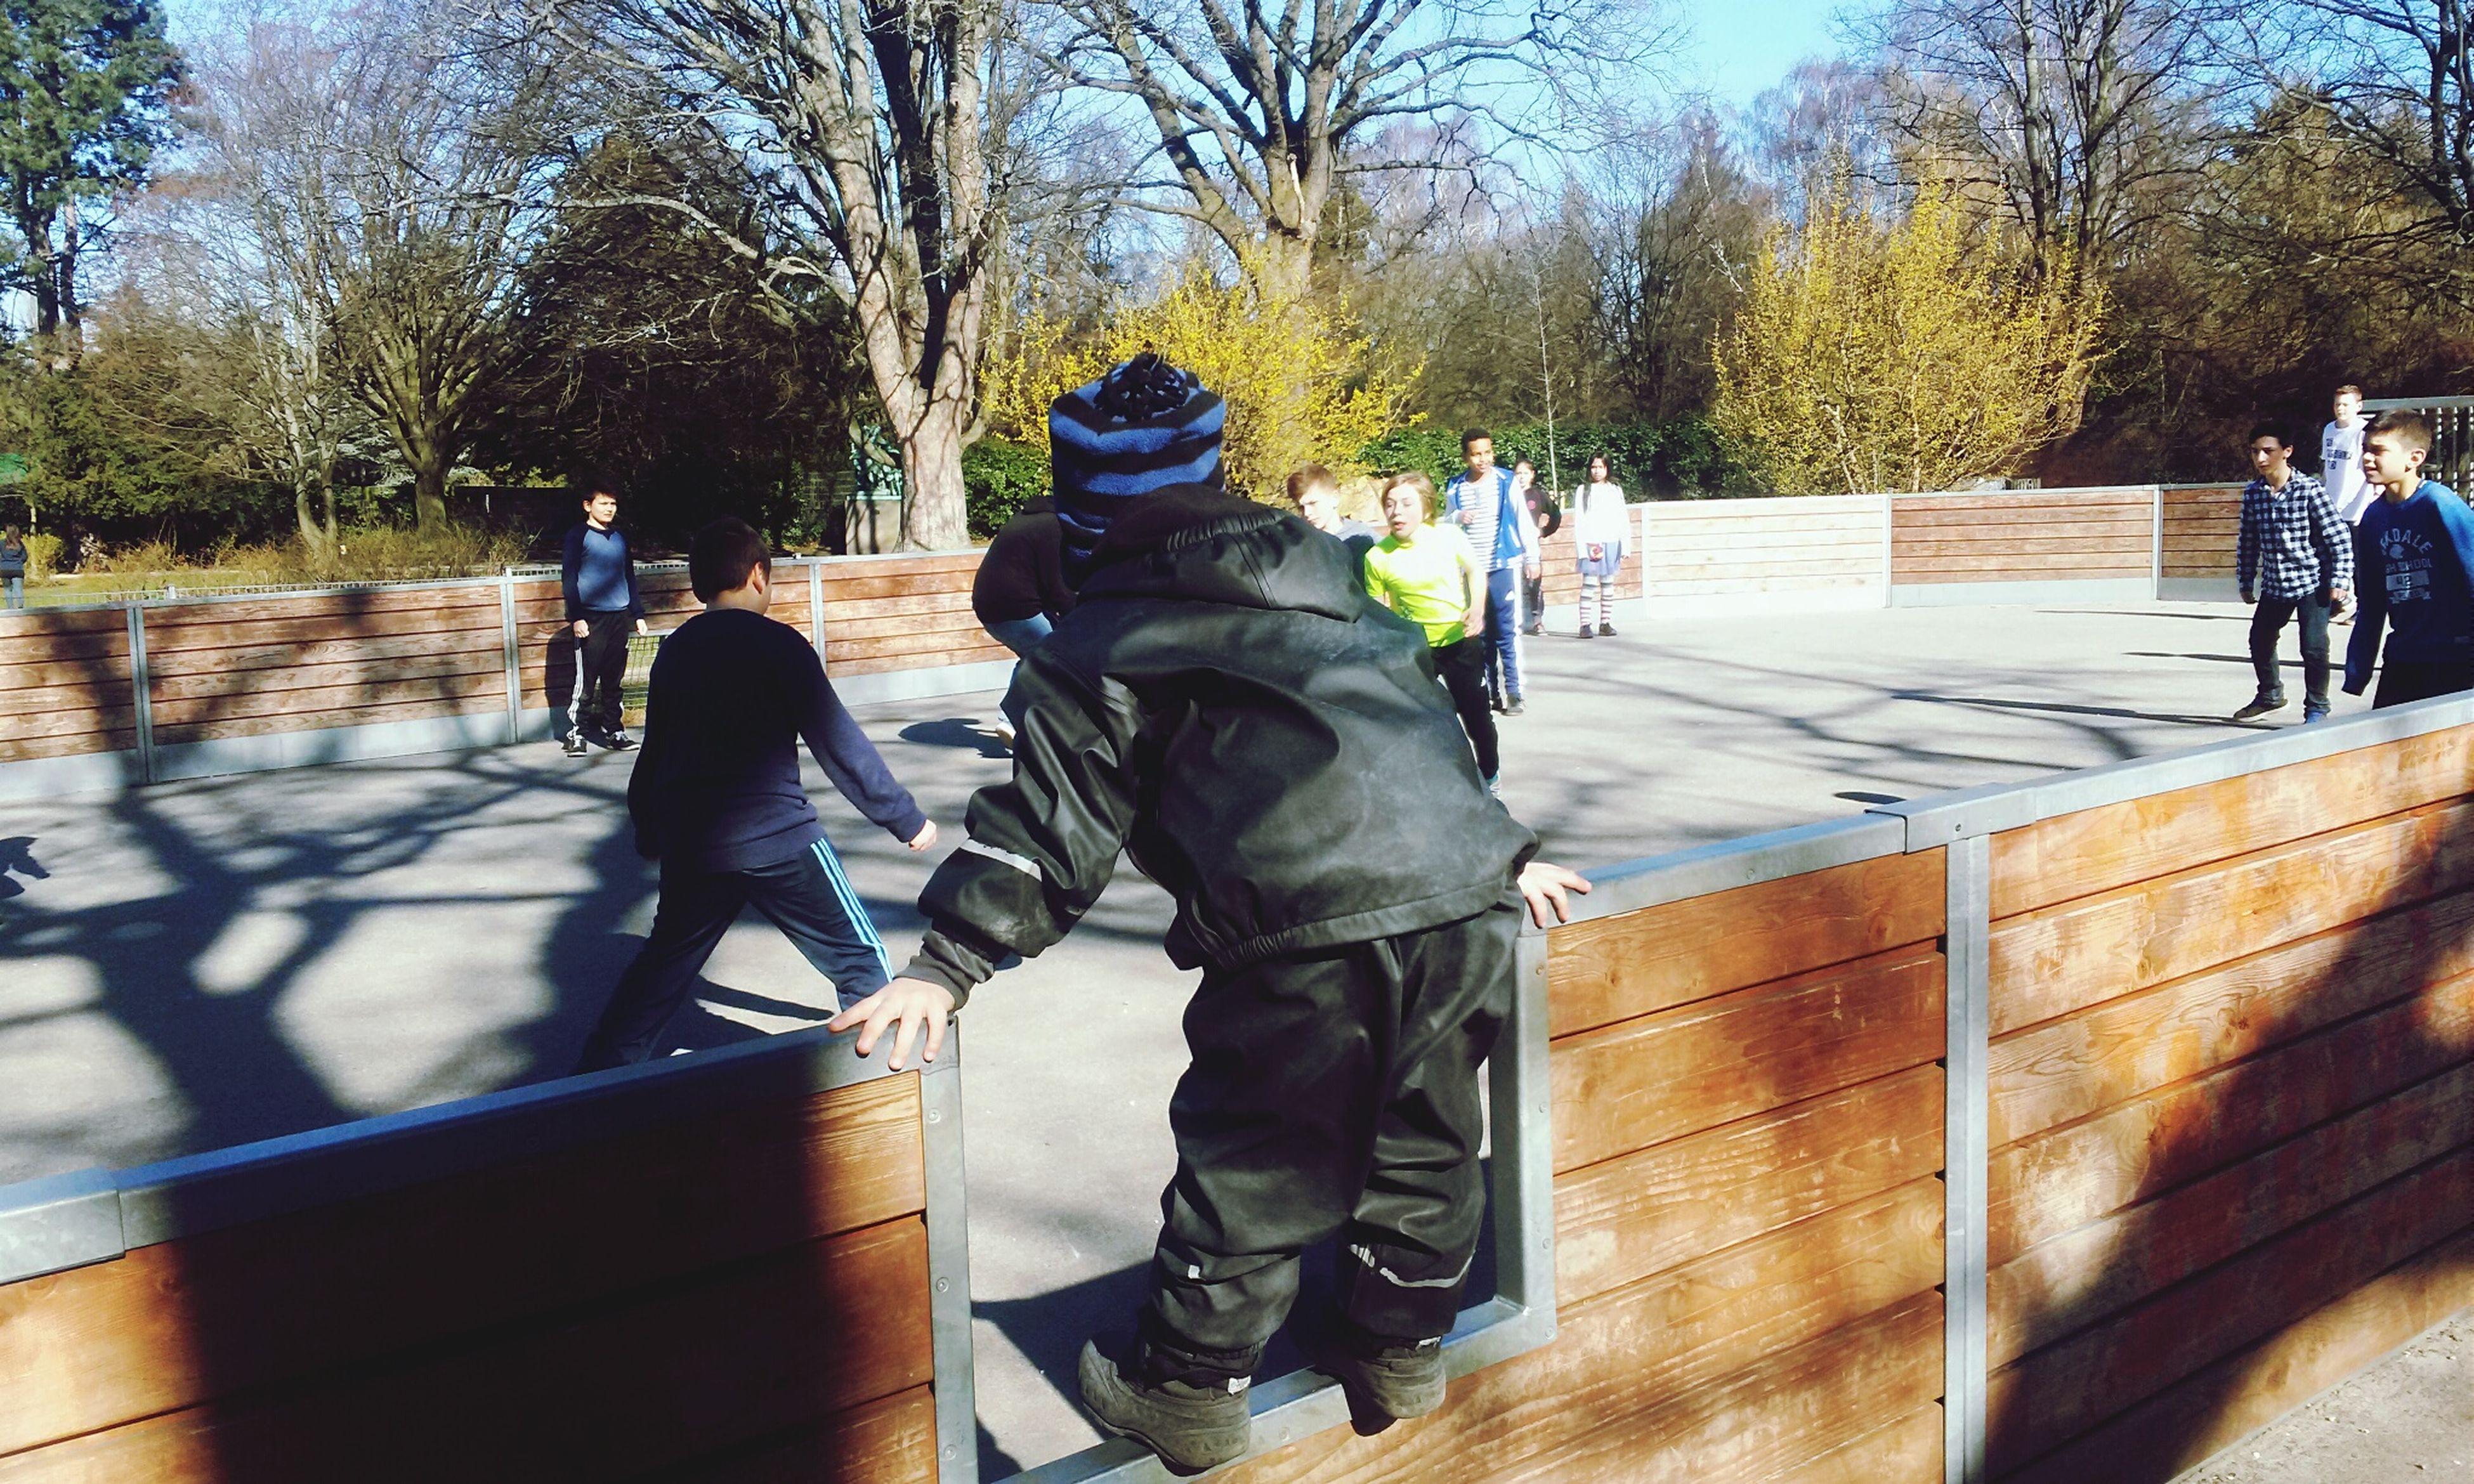 Quality Time Playing Taking Photos Playground At School Joyful Football Footballislife